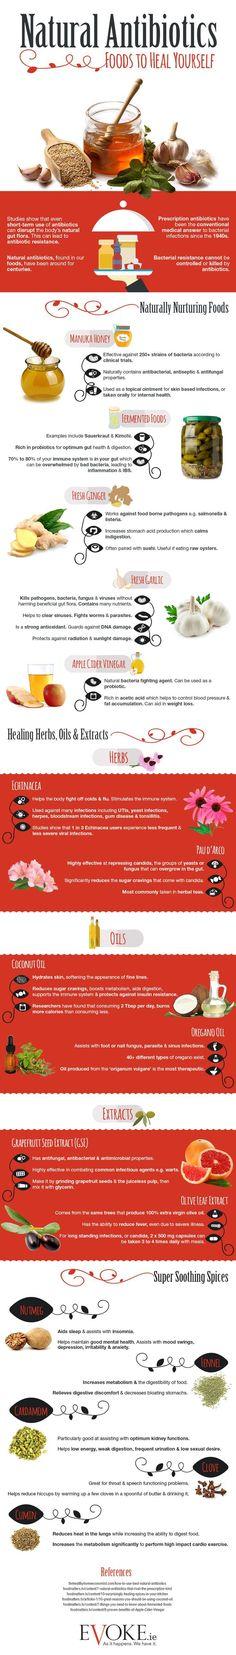 Natural Antibiotics: Foods to Heal Yourself – Infographic